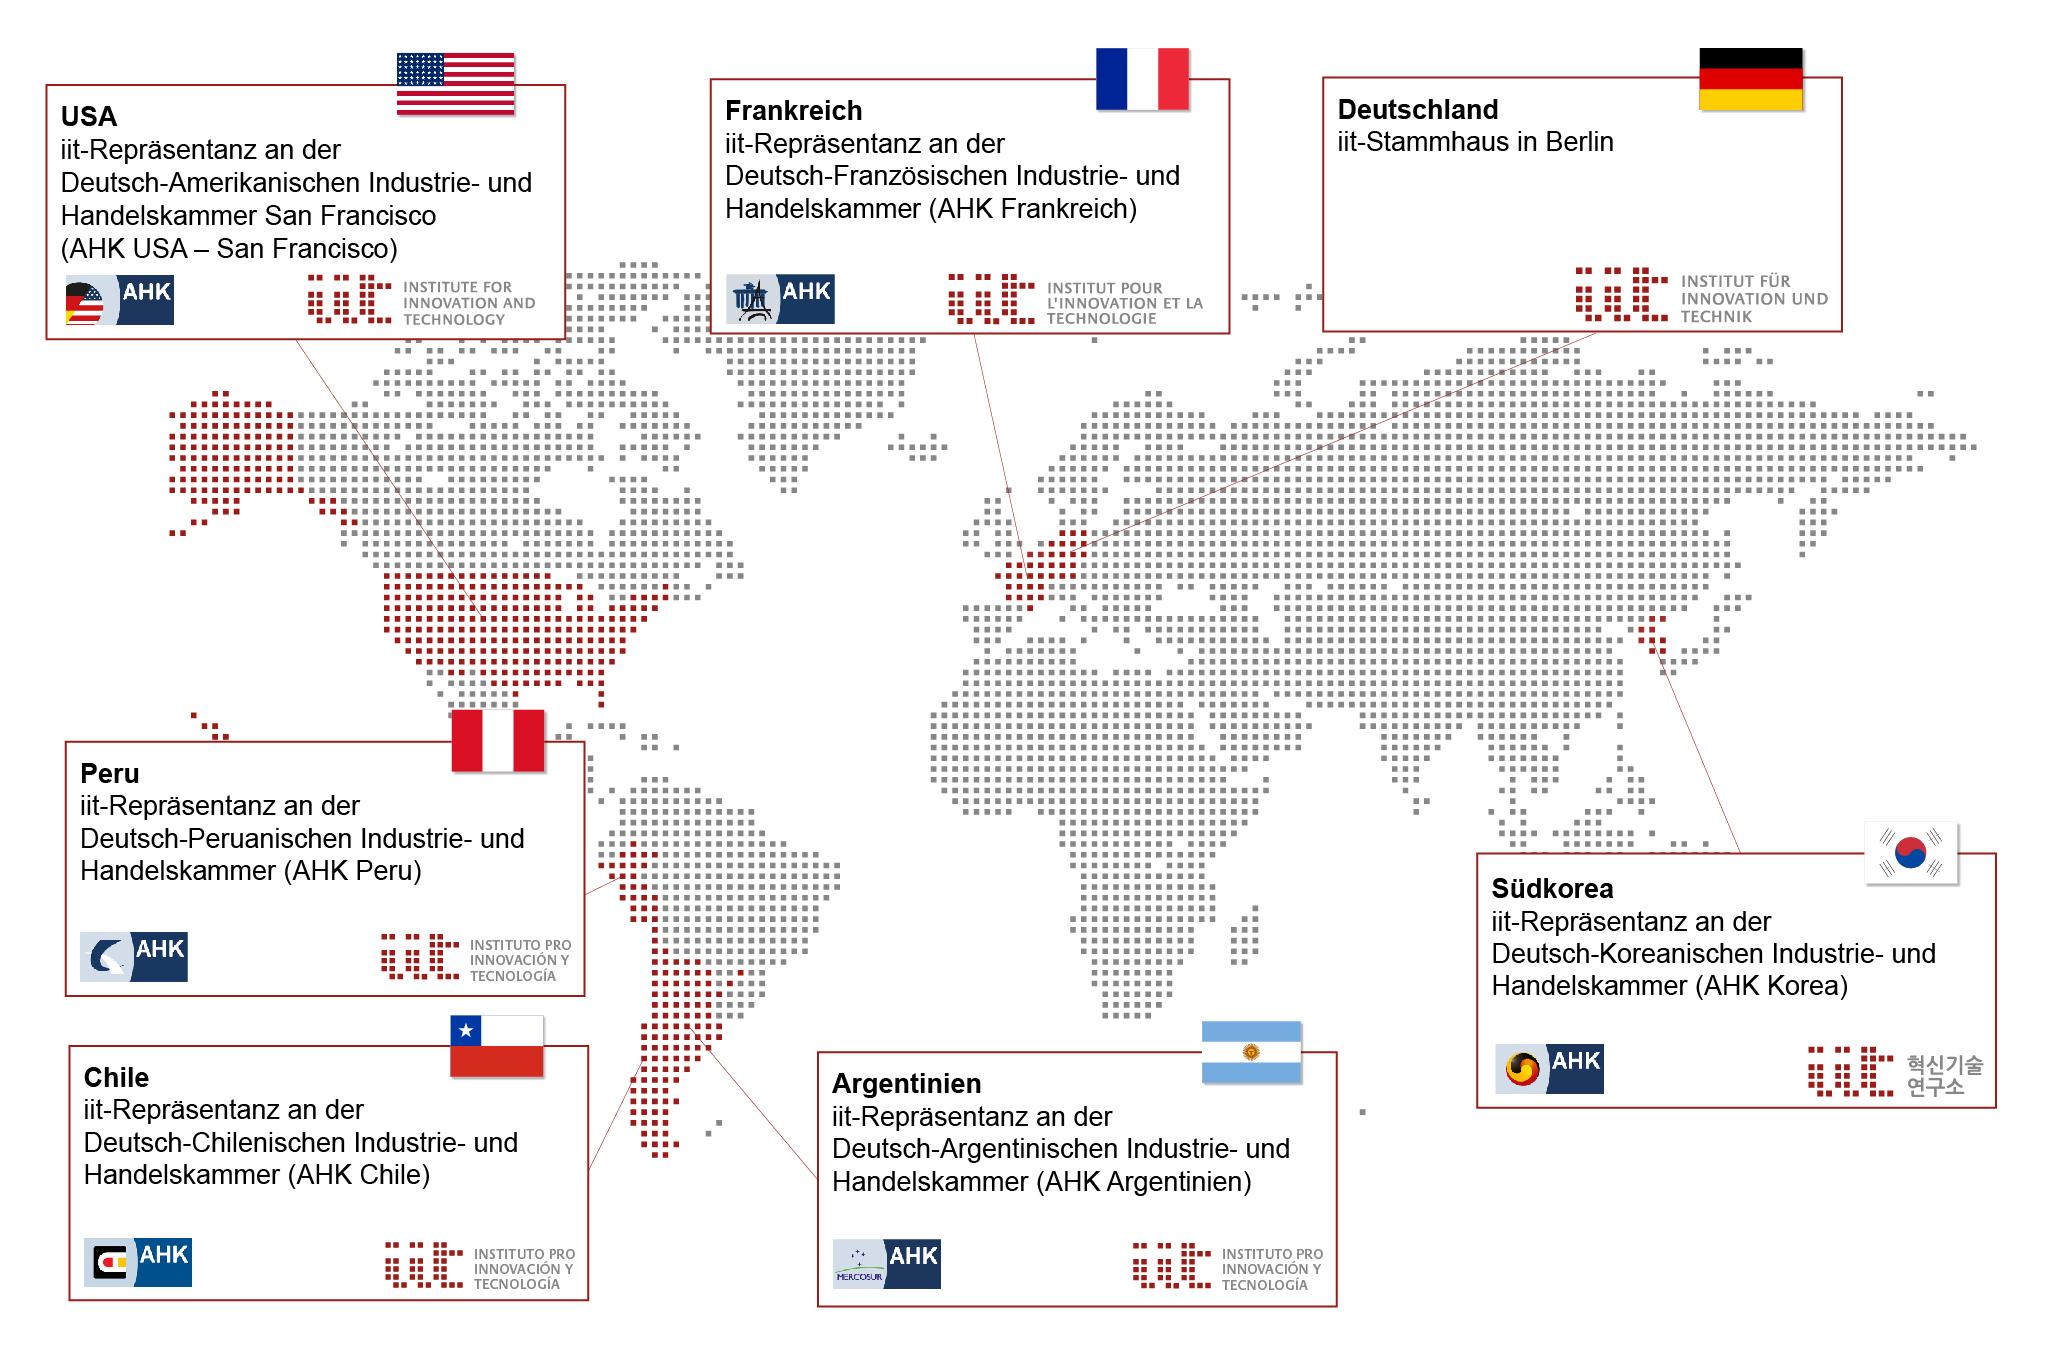 internationale Repräsentanzen des iit